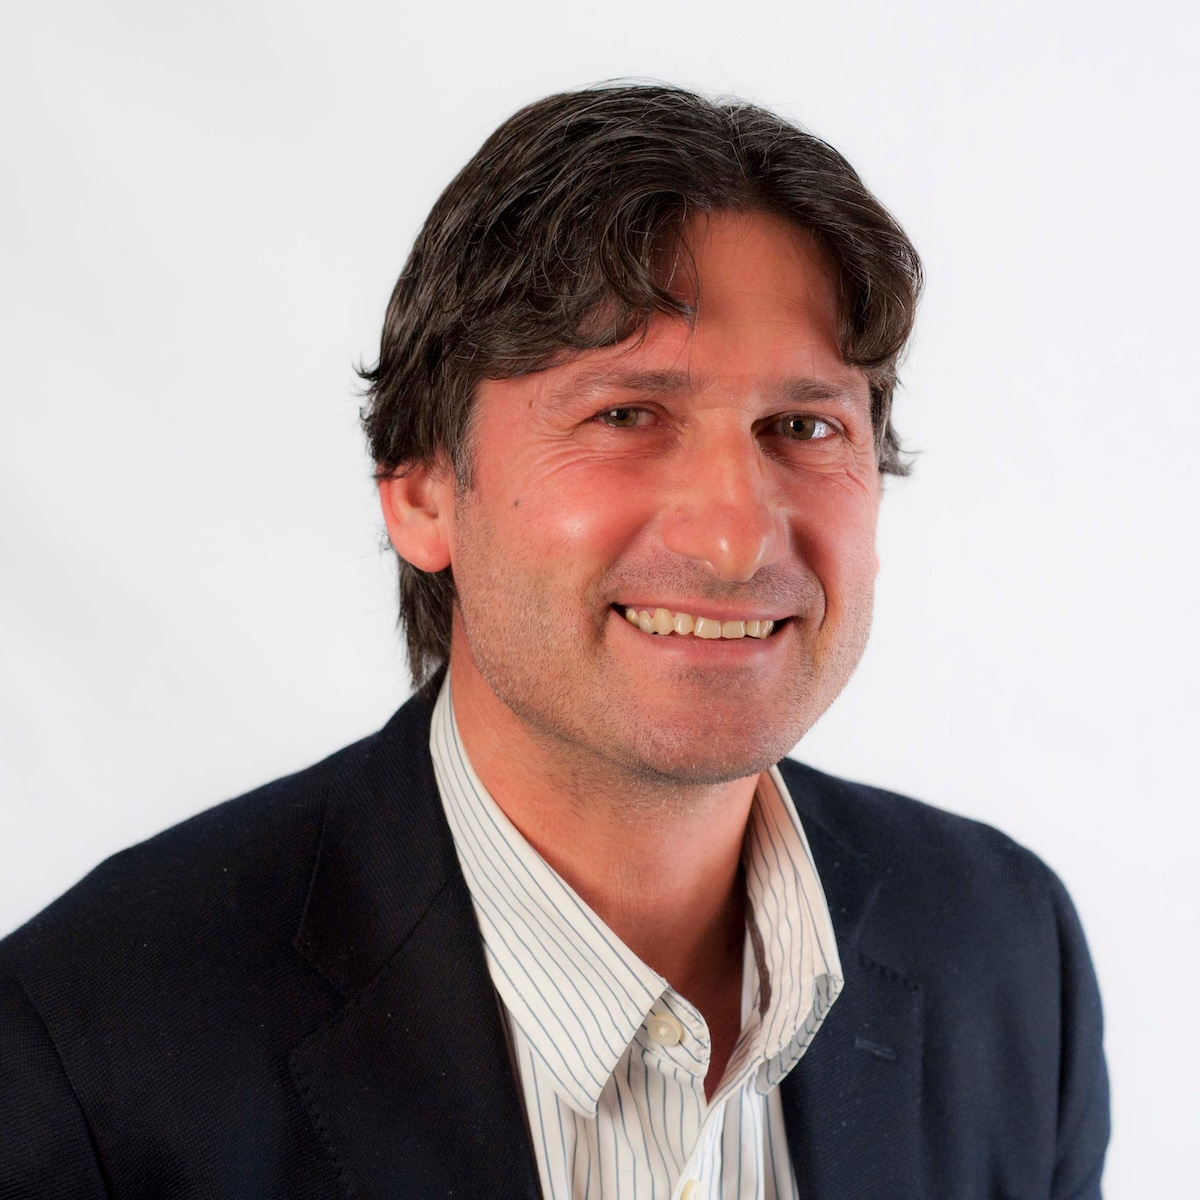 Fabio from Frascati